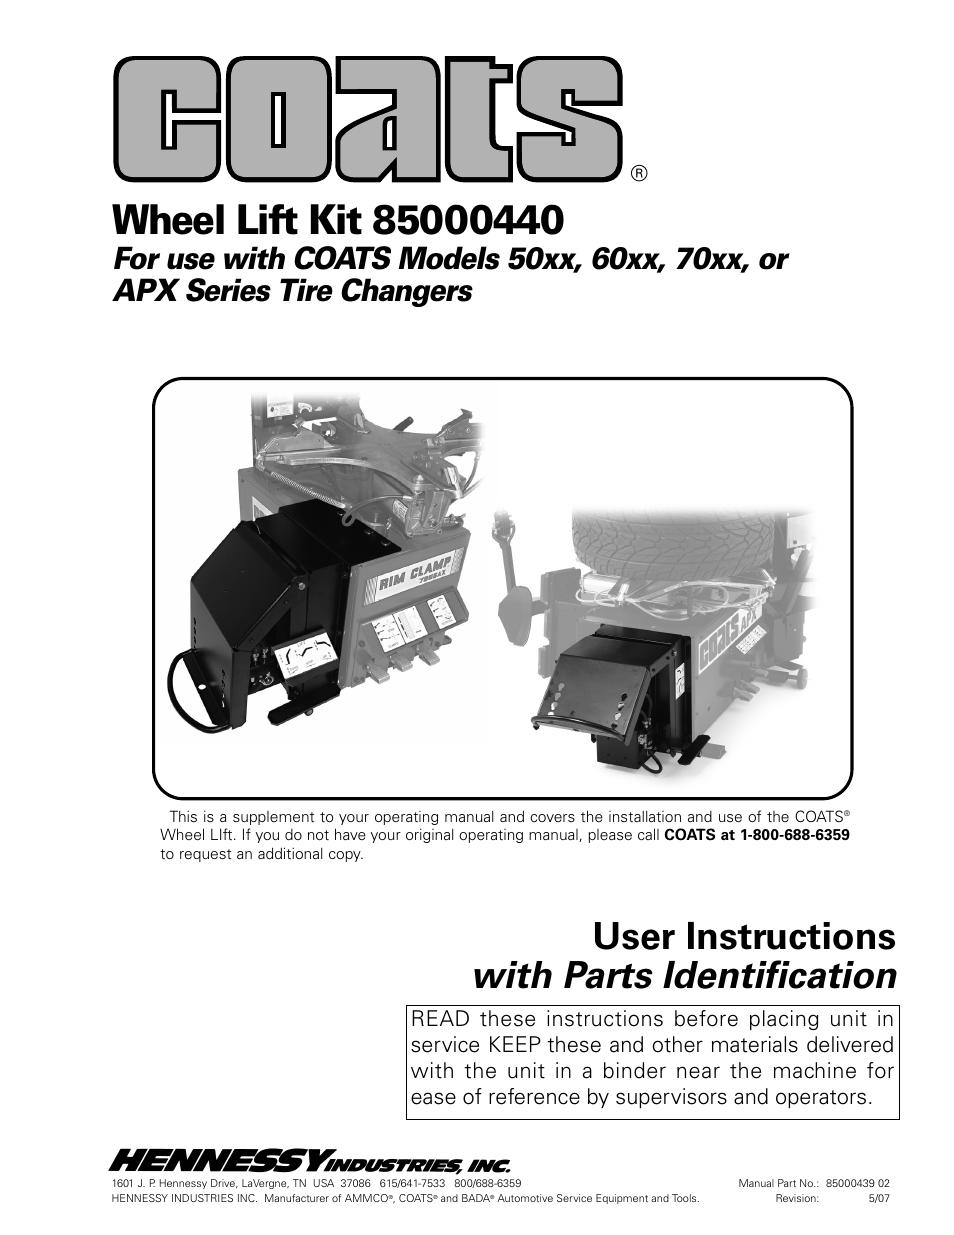 coats kit 85000440 lift accessory user manual 8 pages rh manualsdir com Coats Ammco Equipment Distributors Ammco Tire Changers